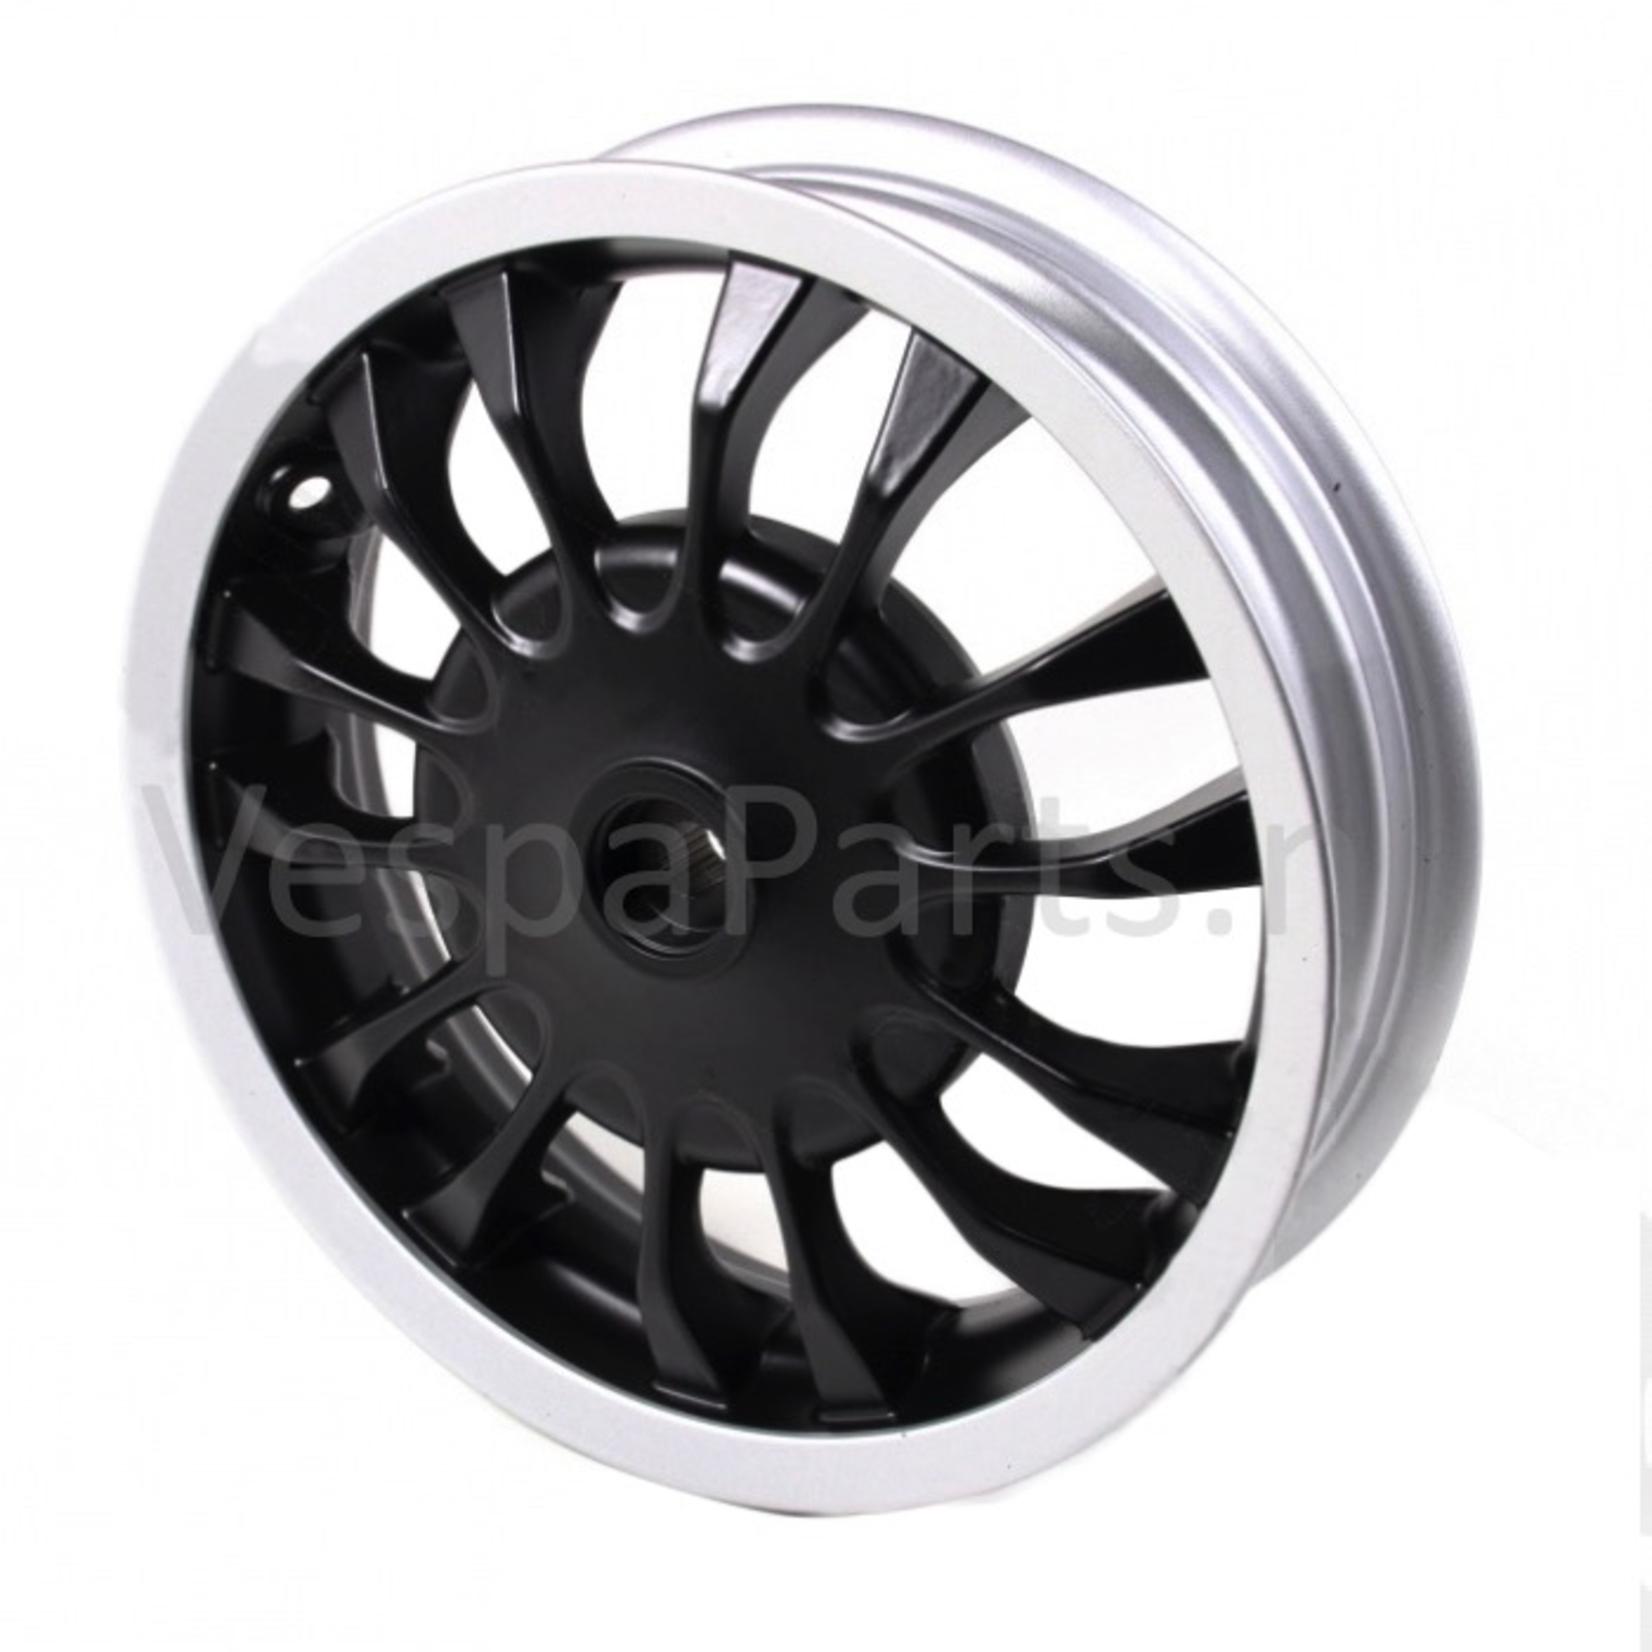 "Accessories Wheel Rim, Sprint/Primavera Black 12"" Rear"